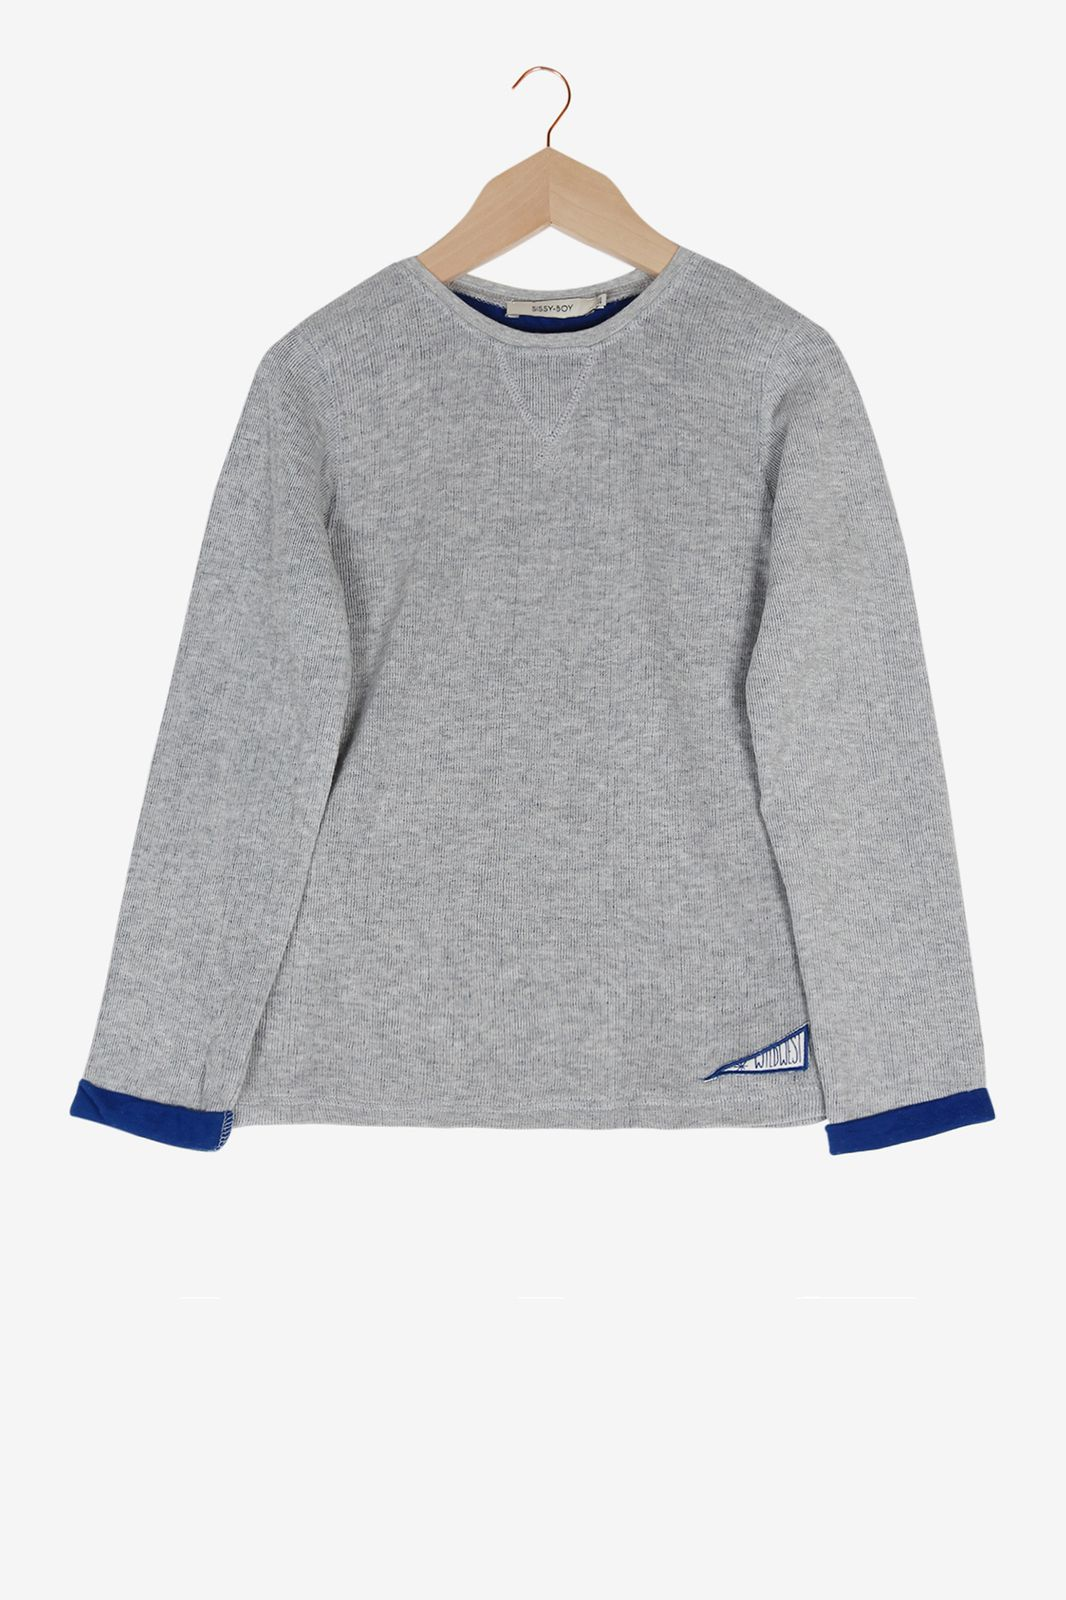 Grijs T-shirt lange mouwen - Kids | Sissy-Boy